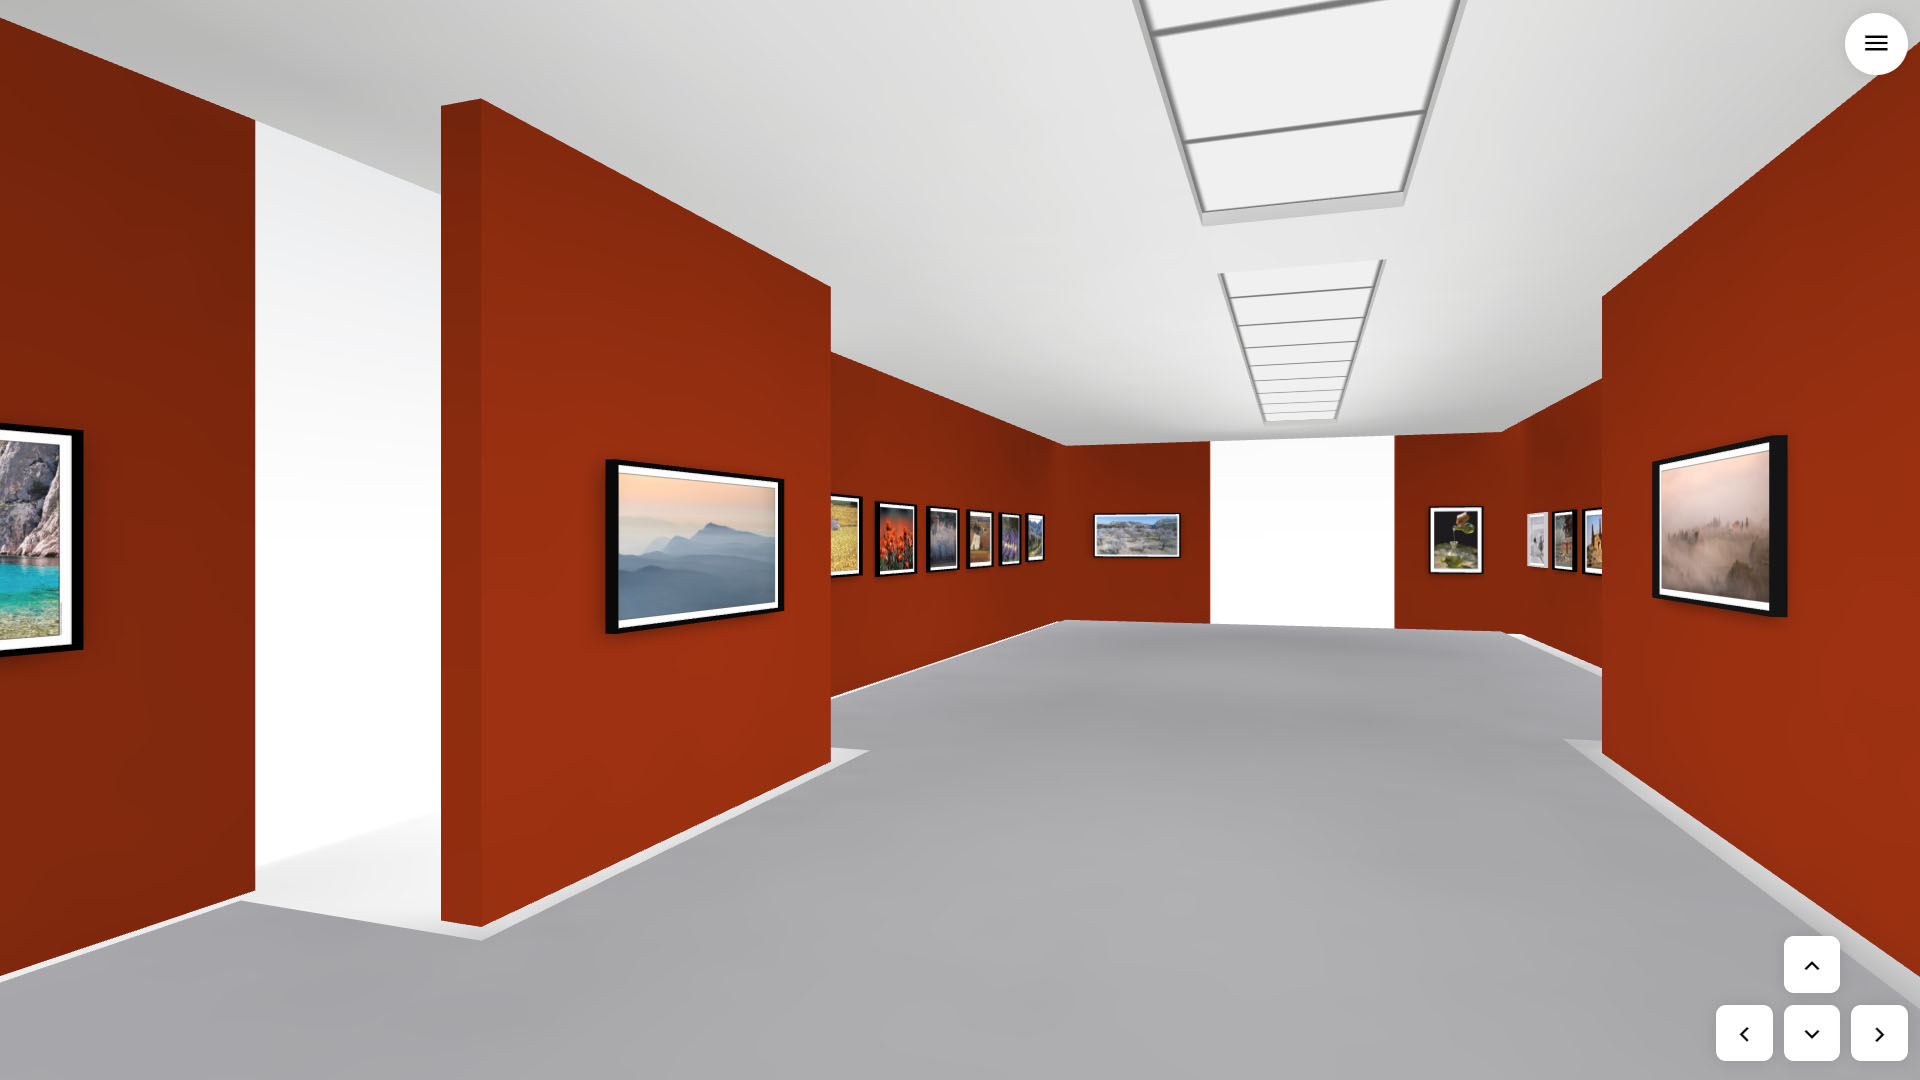 3d Exhibition Rooms Gilles Martin Raget Marine Sailing